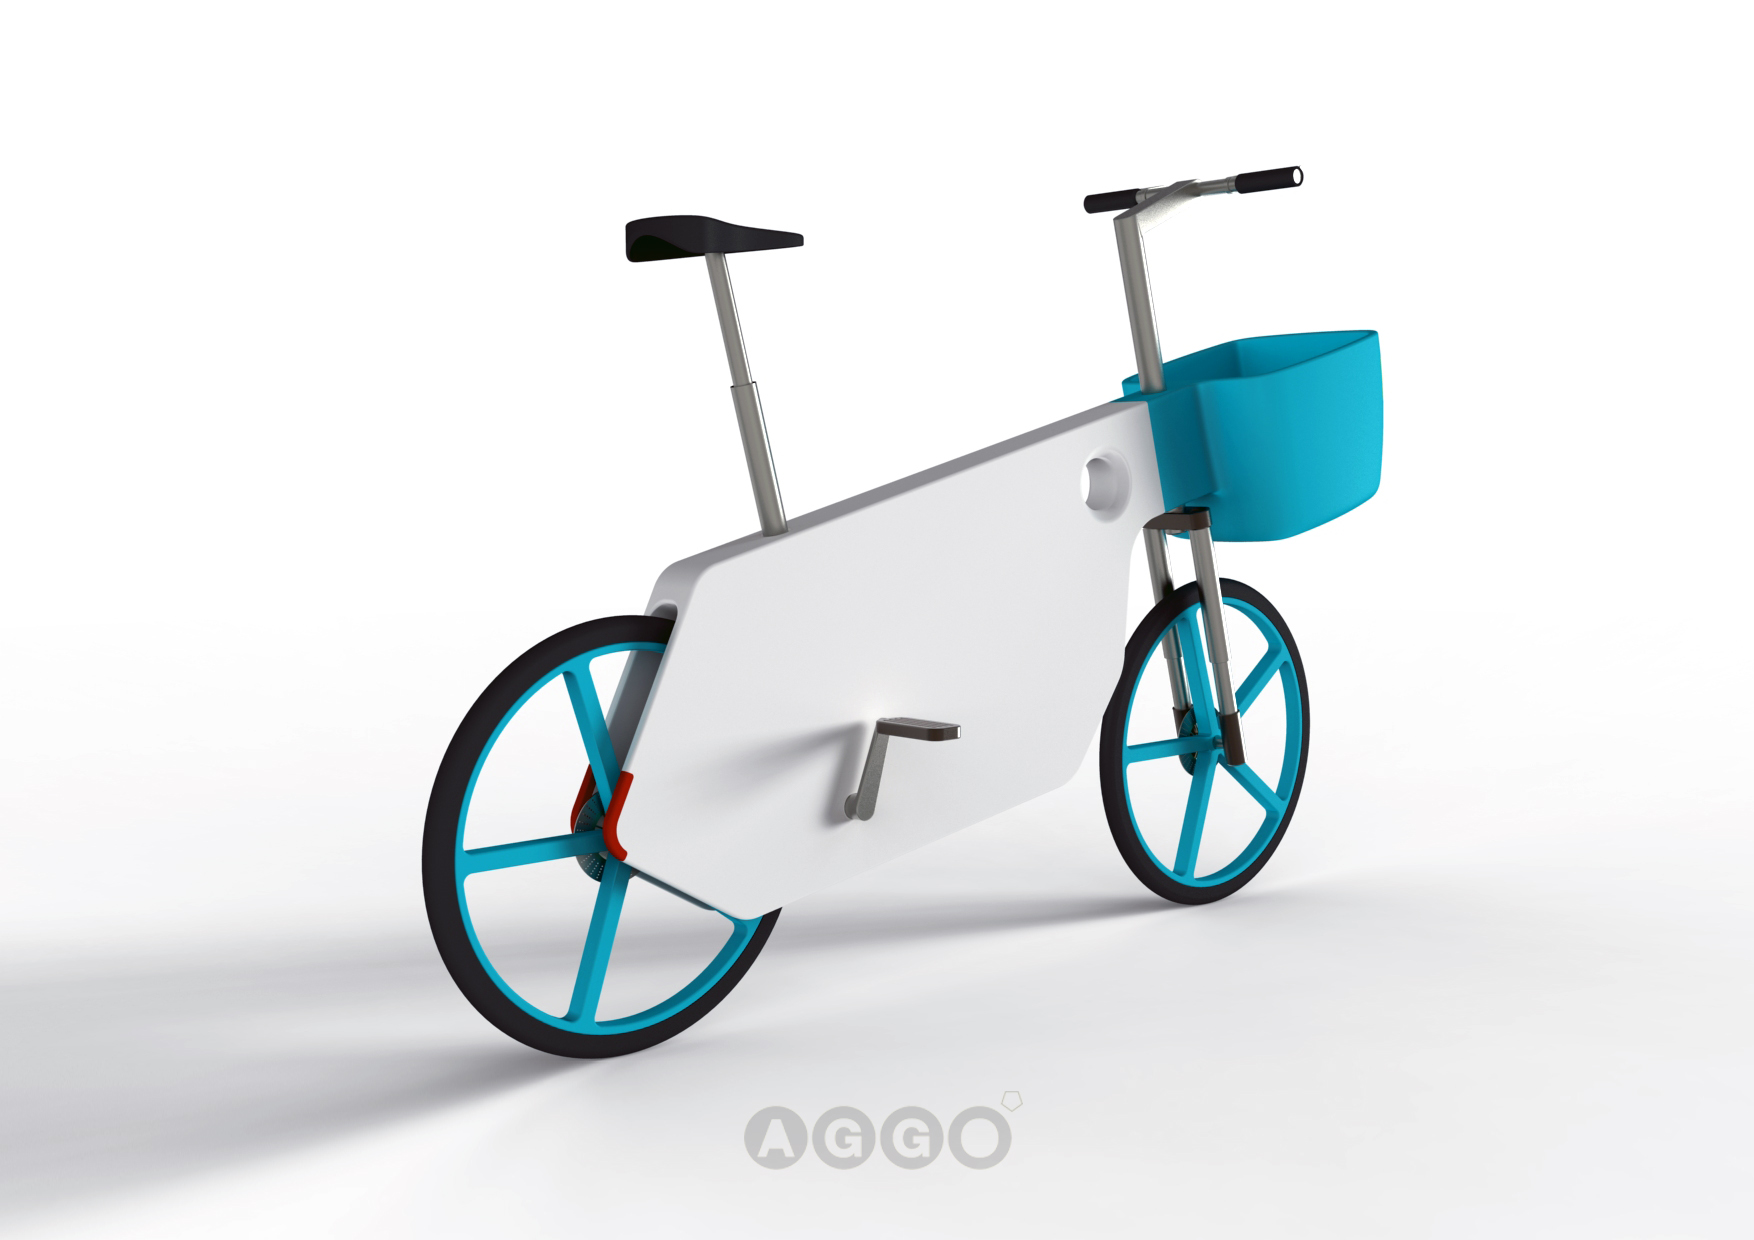 aggo_tesla_bike017.jpg